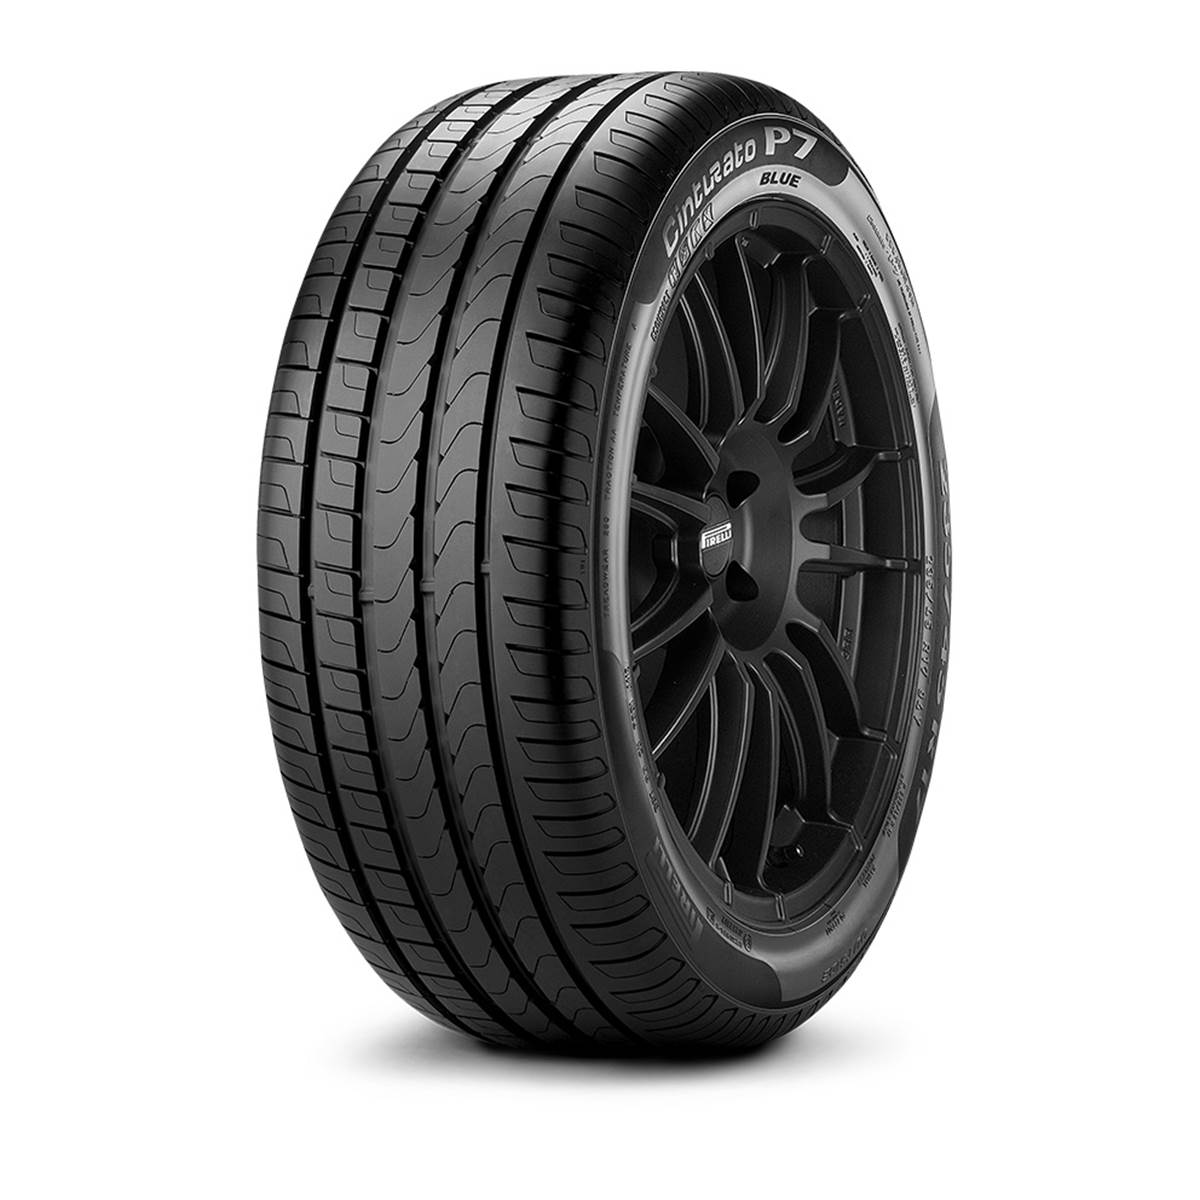 Pneu Pirelli 215/55R17 98W Cinturato P7 Blue XL